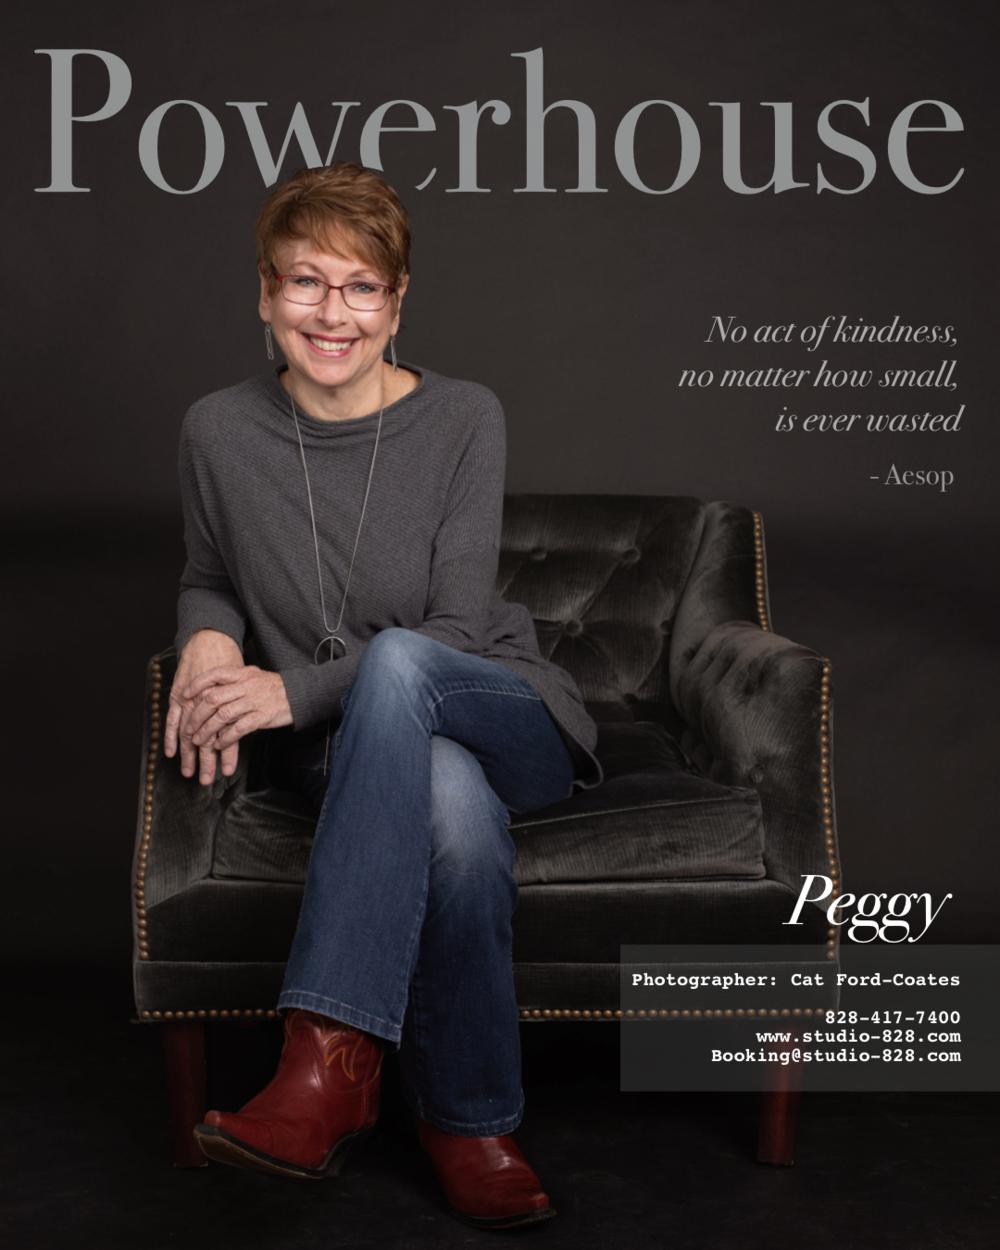 powerhouse - women in business - community involvement in Asheville